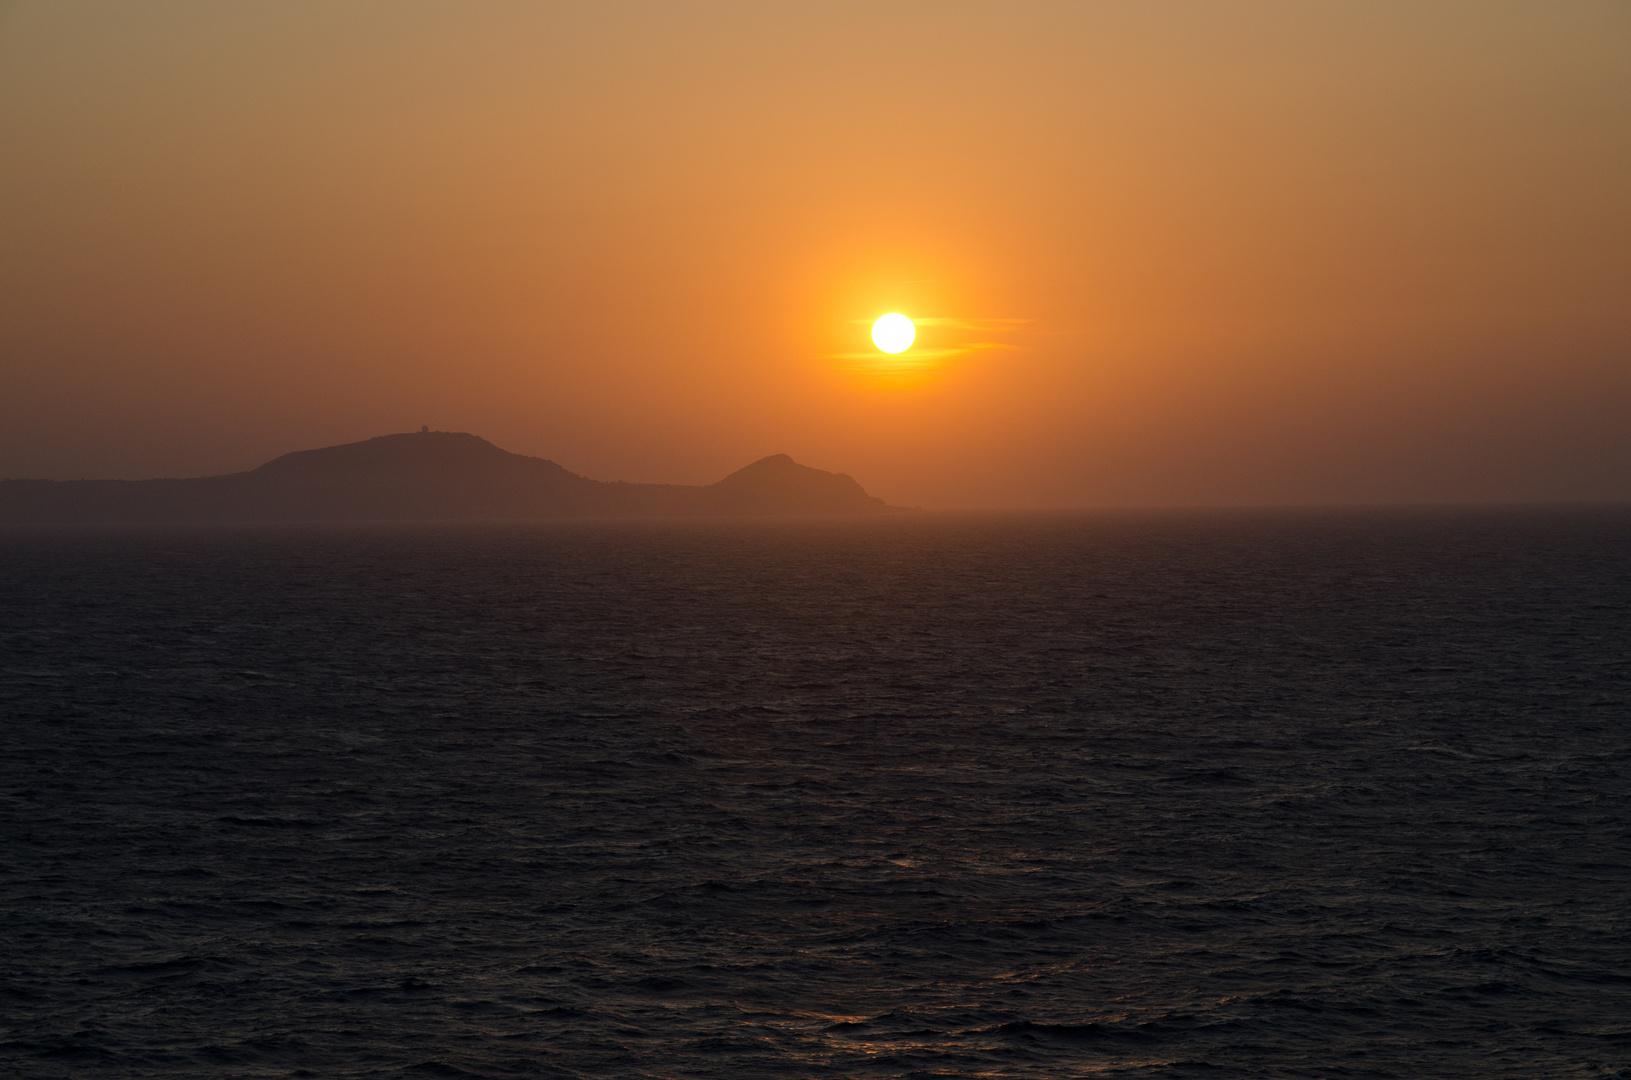 Sonnenuntergang bei Palermo